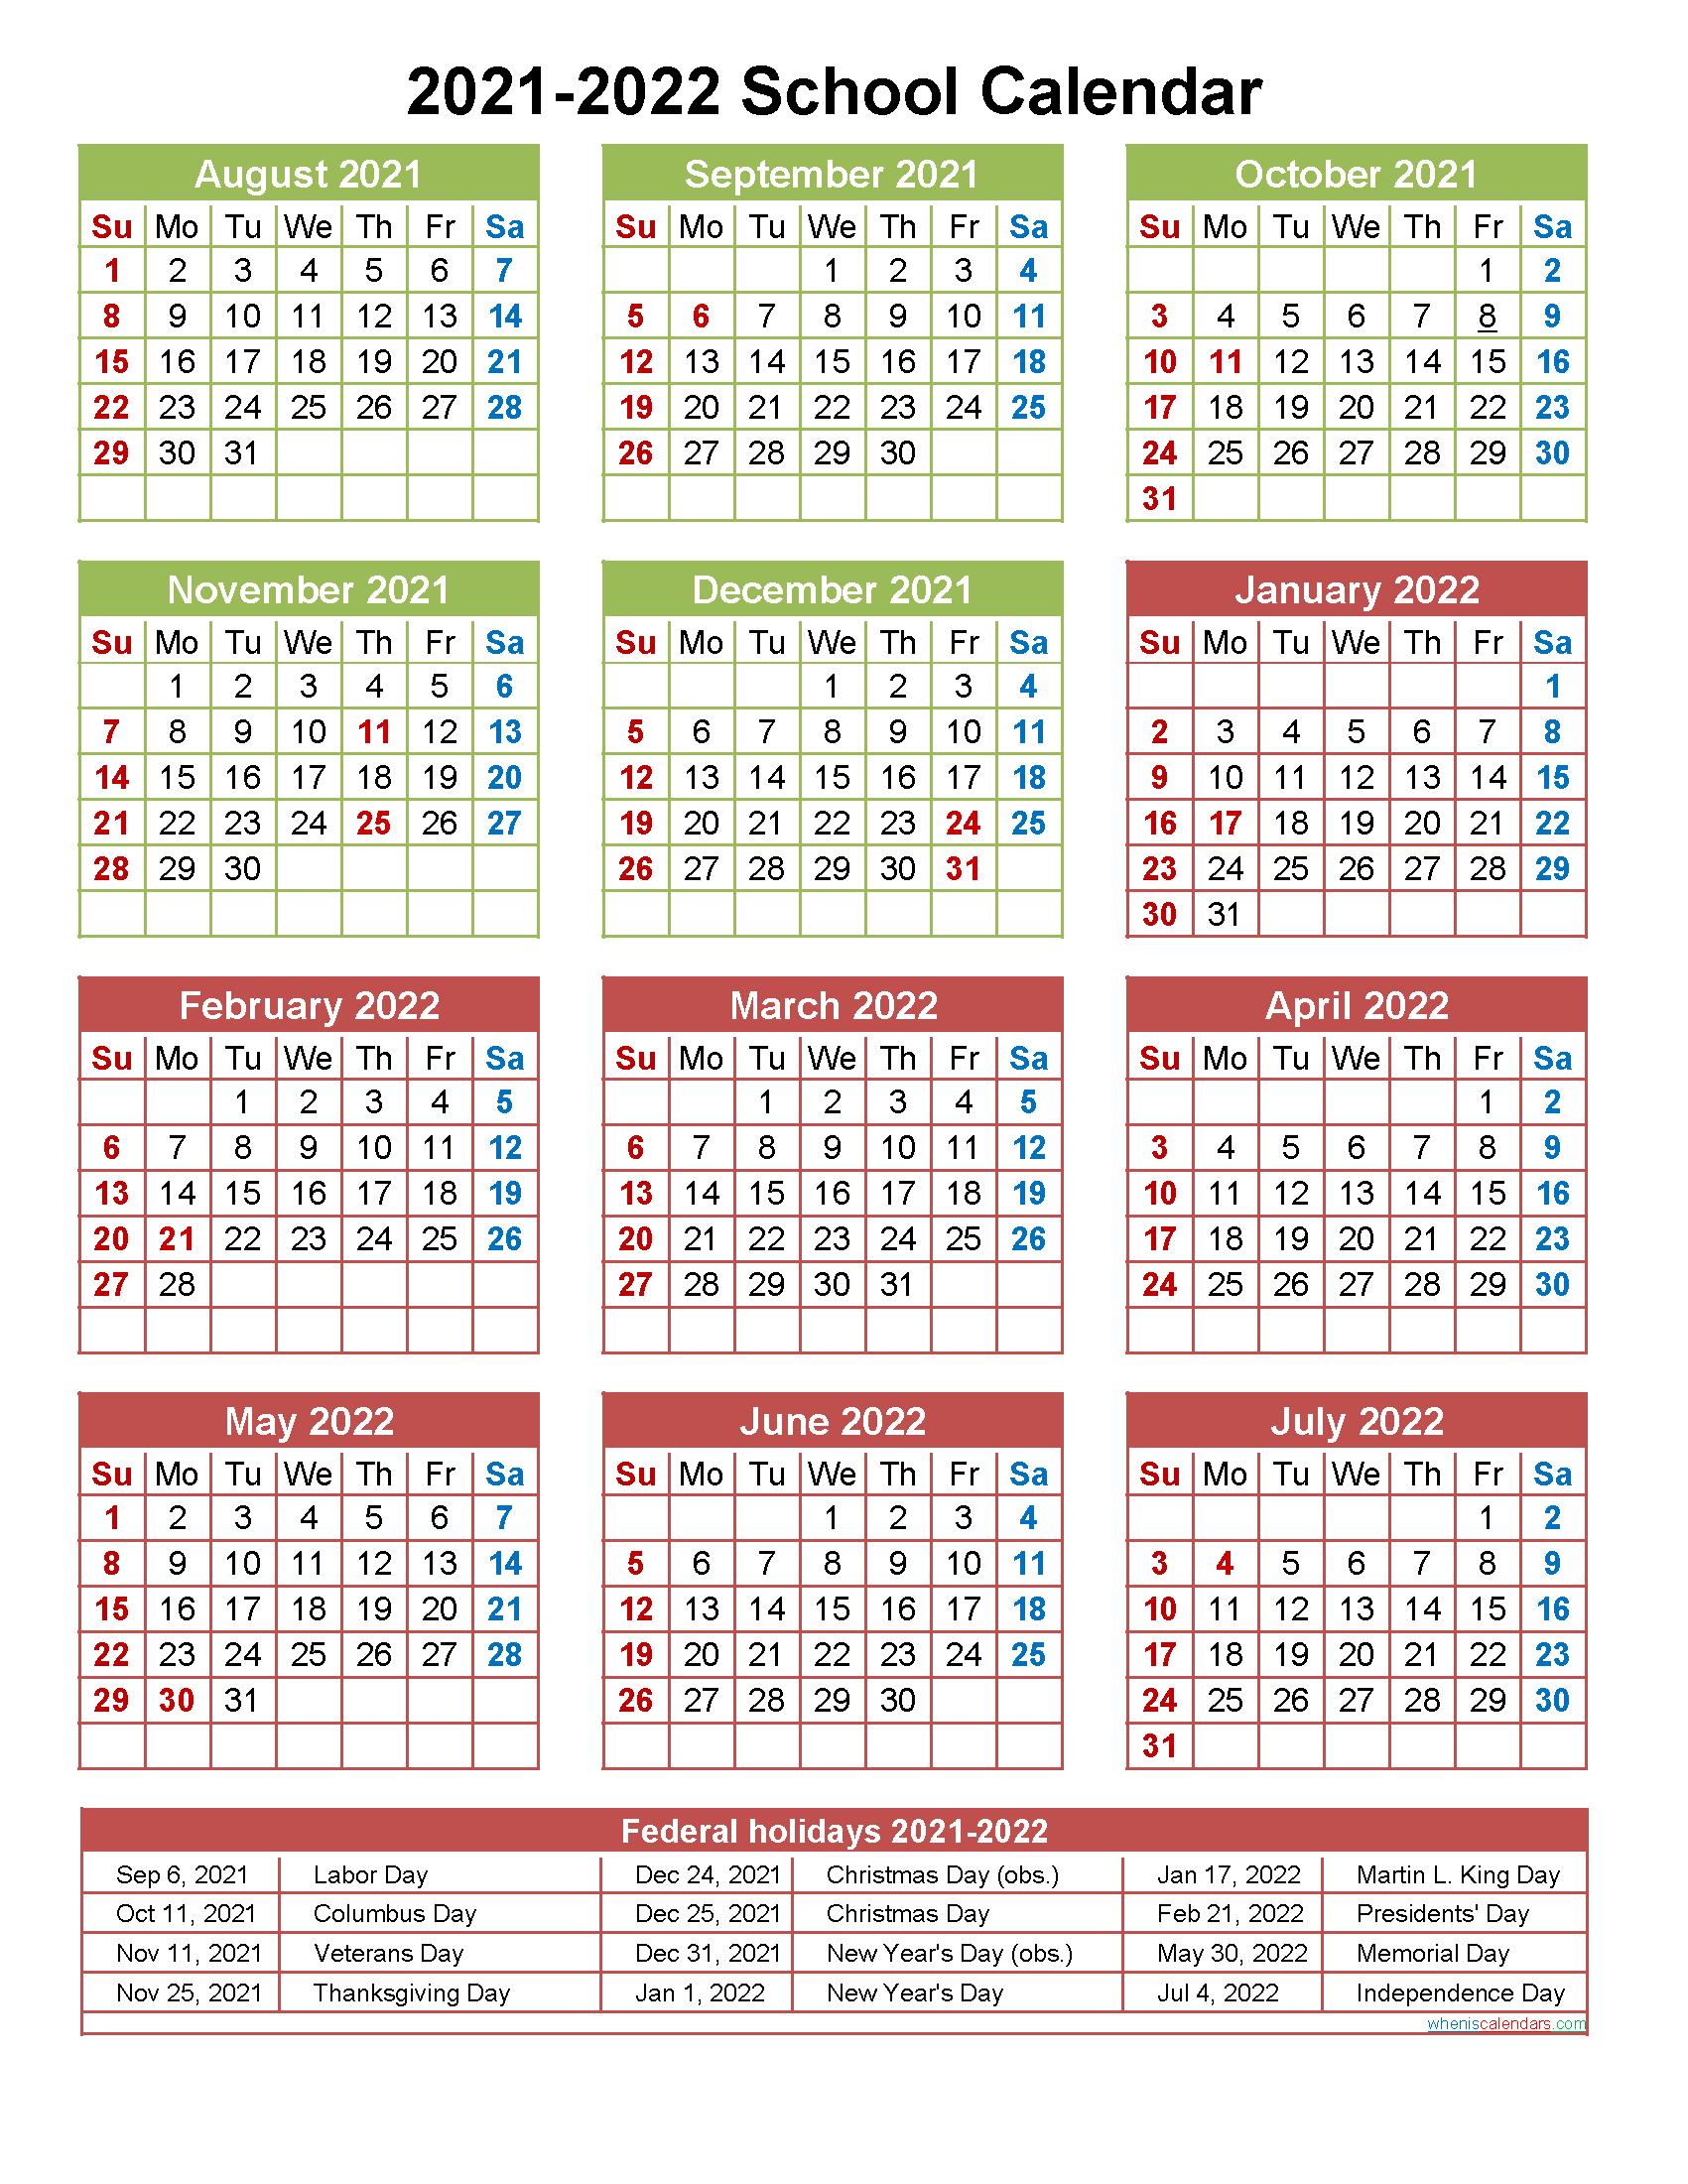 2021 and 2022 School Calendar Printable